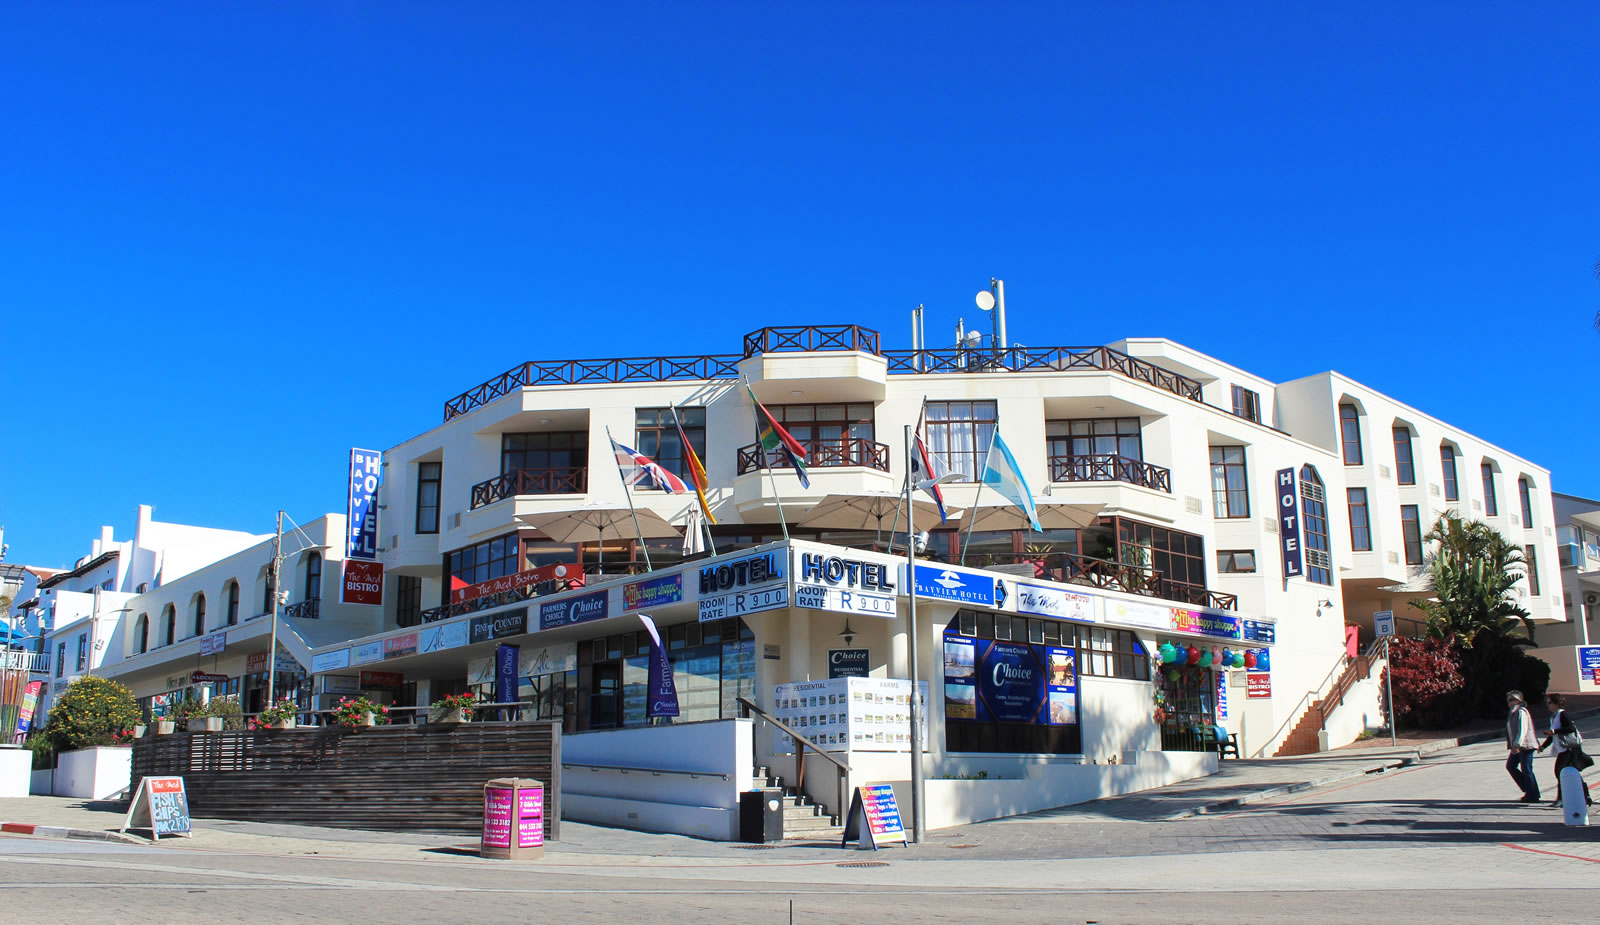 Bayview Hotel in Plettenberg Bay